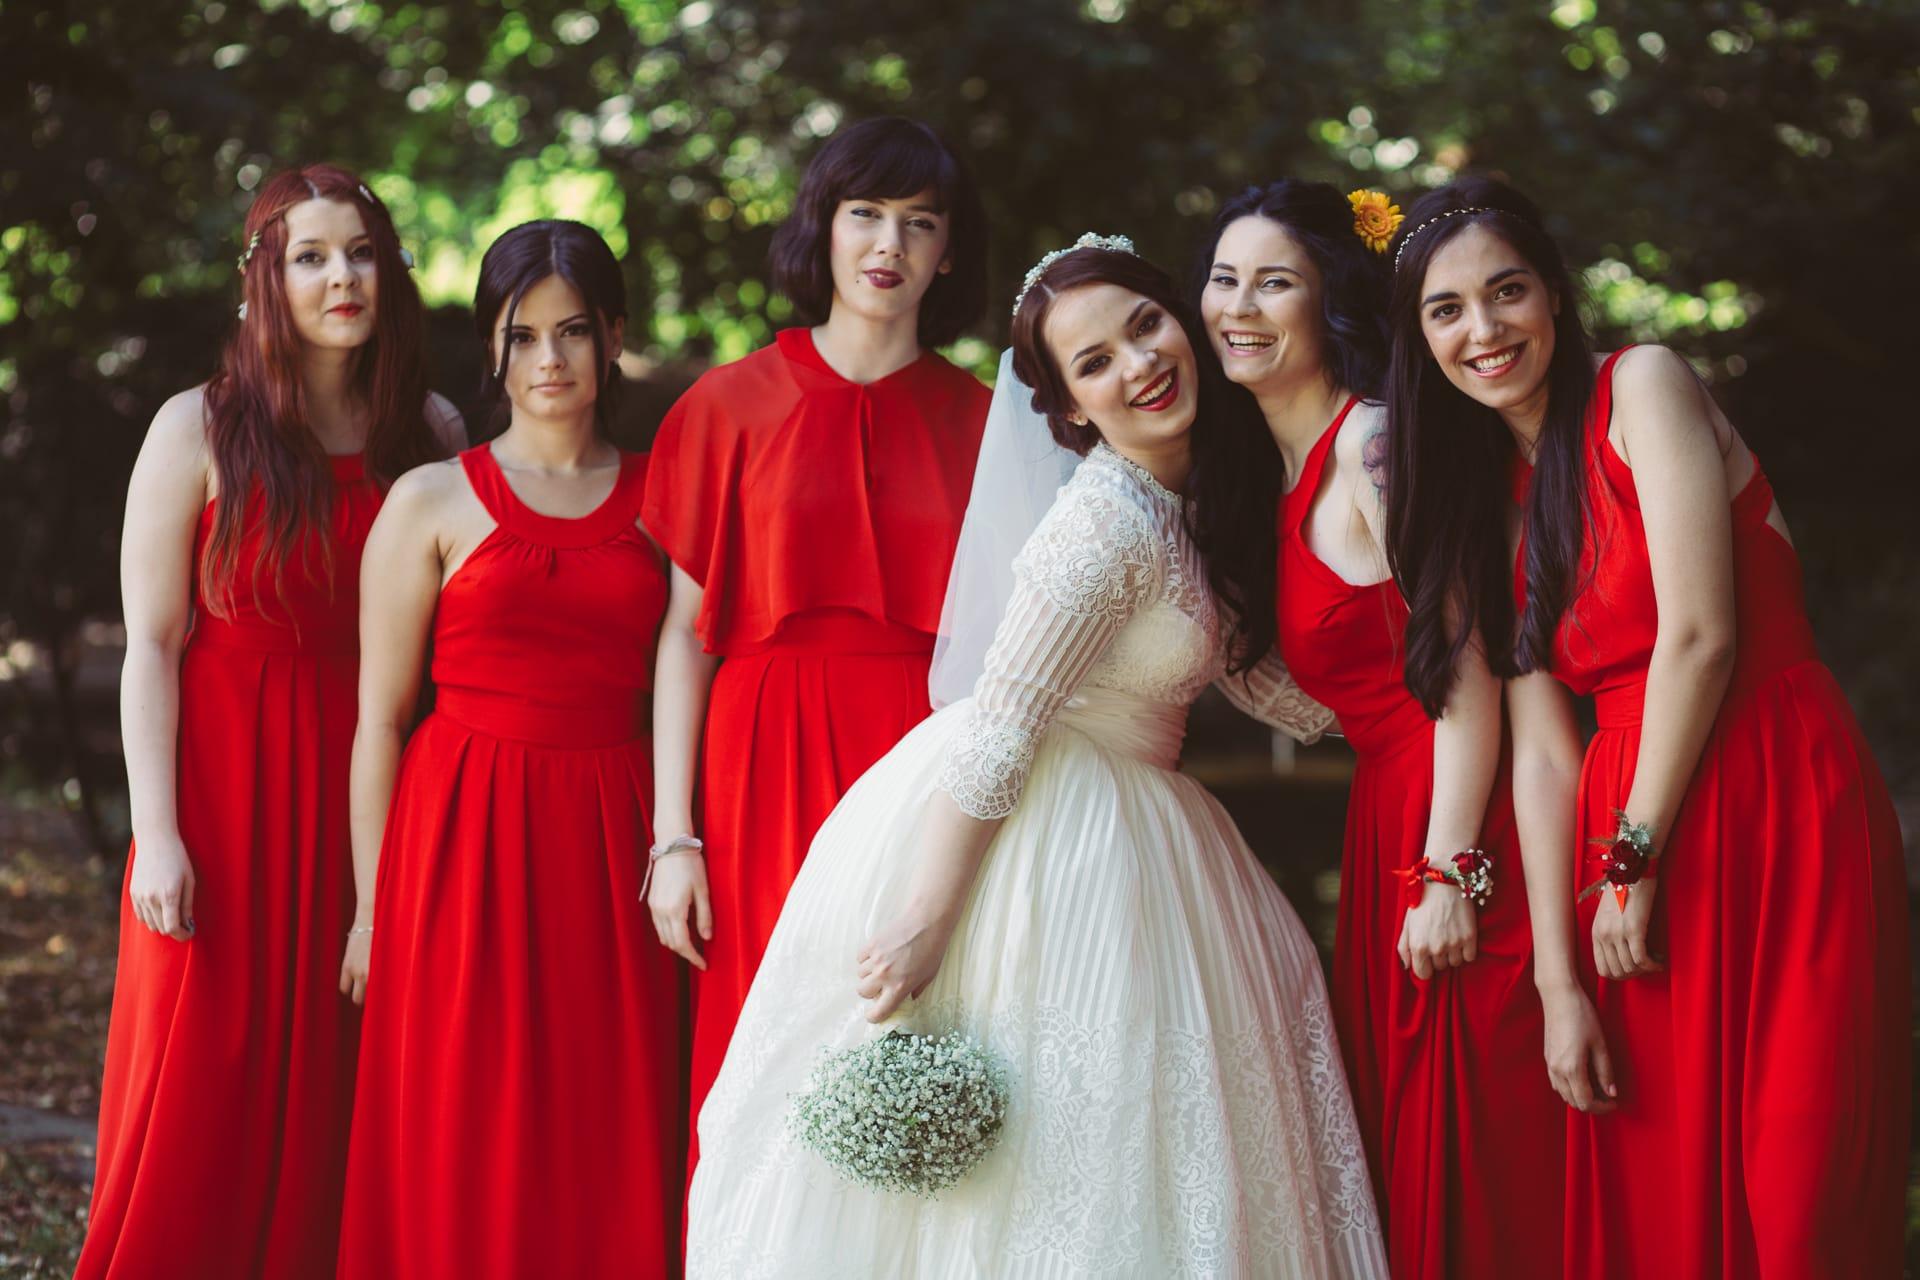 fotograf nunta craiova dragos stoenica raluca si andrei 0247